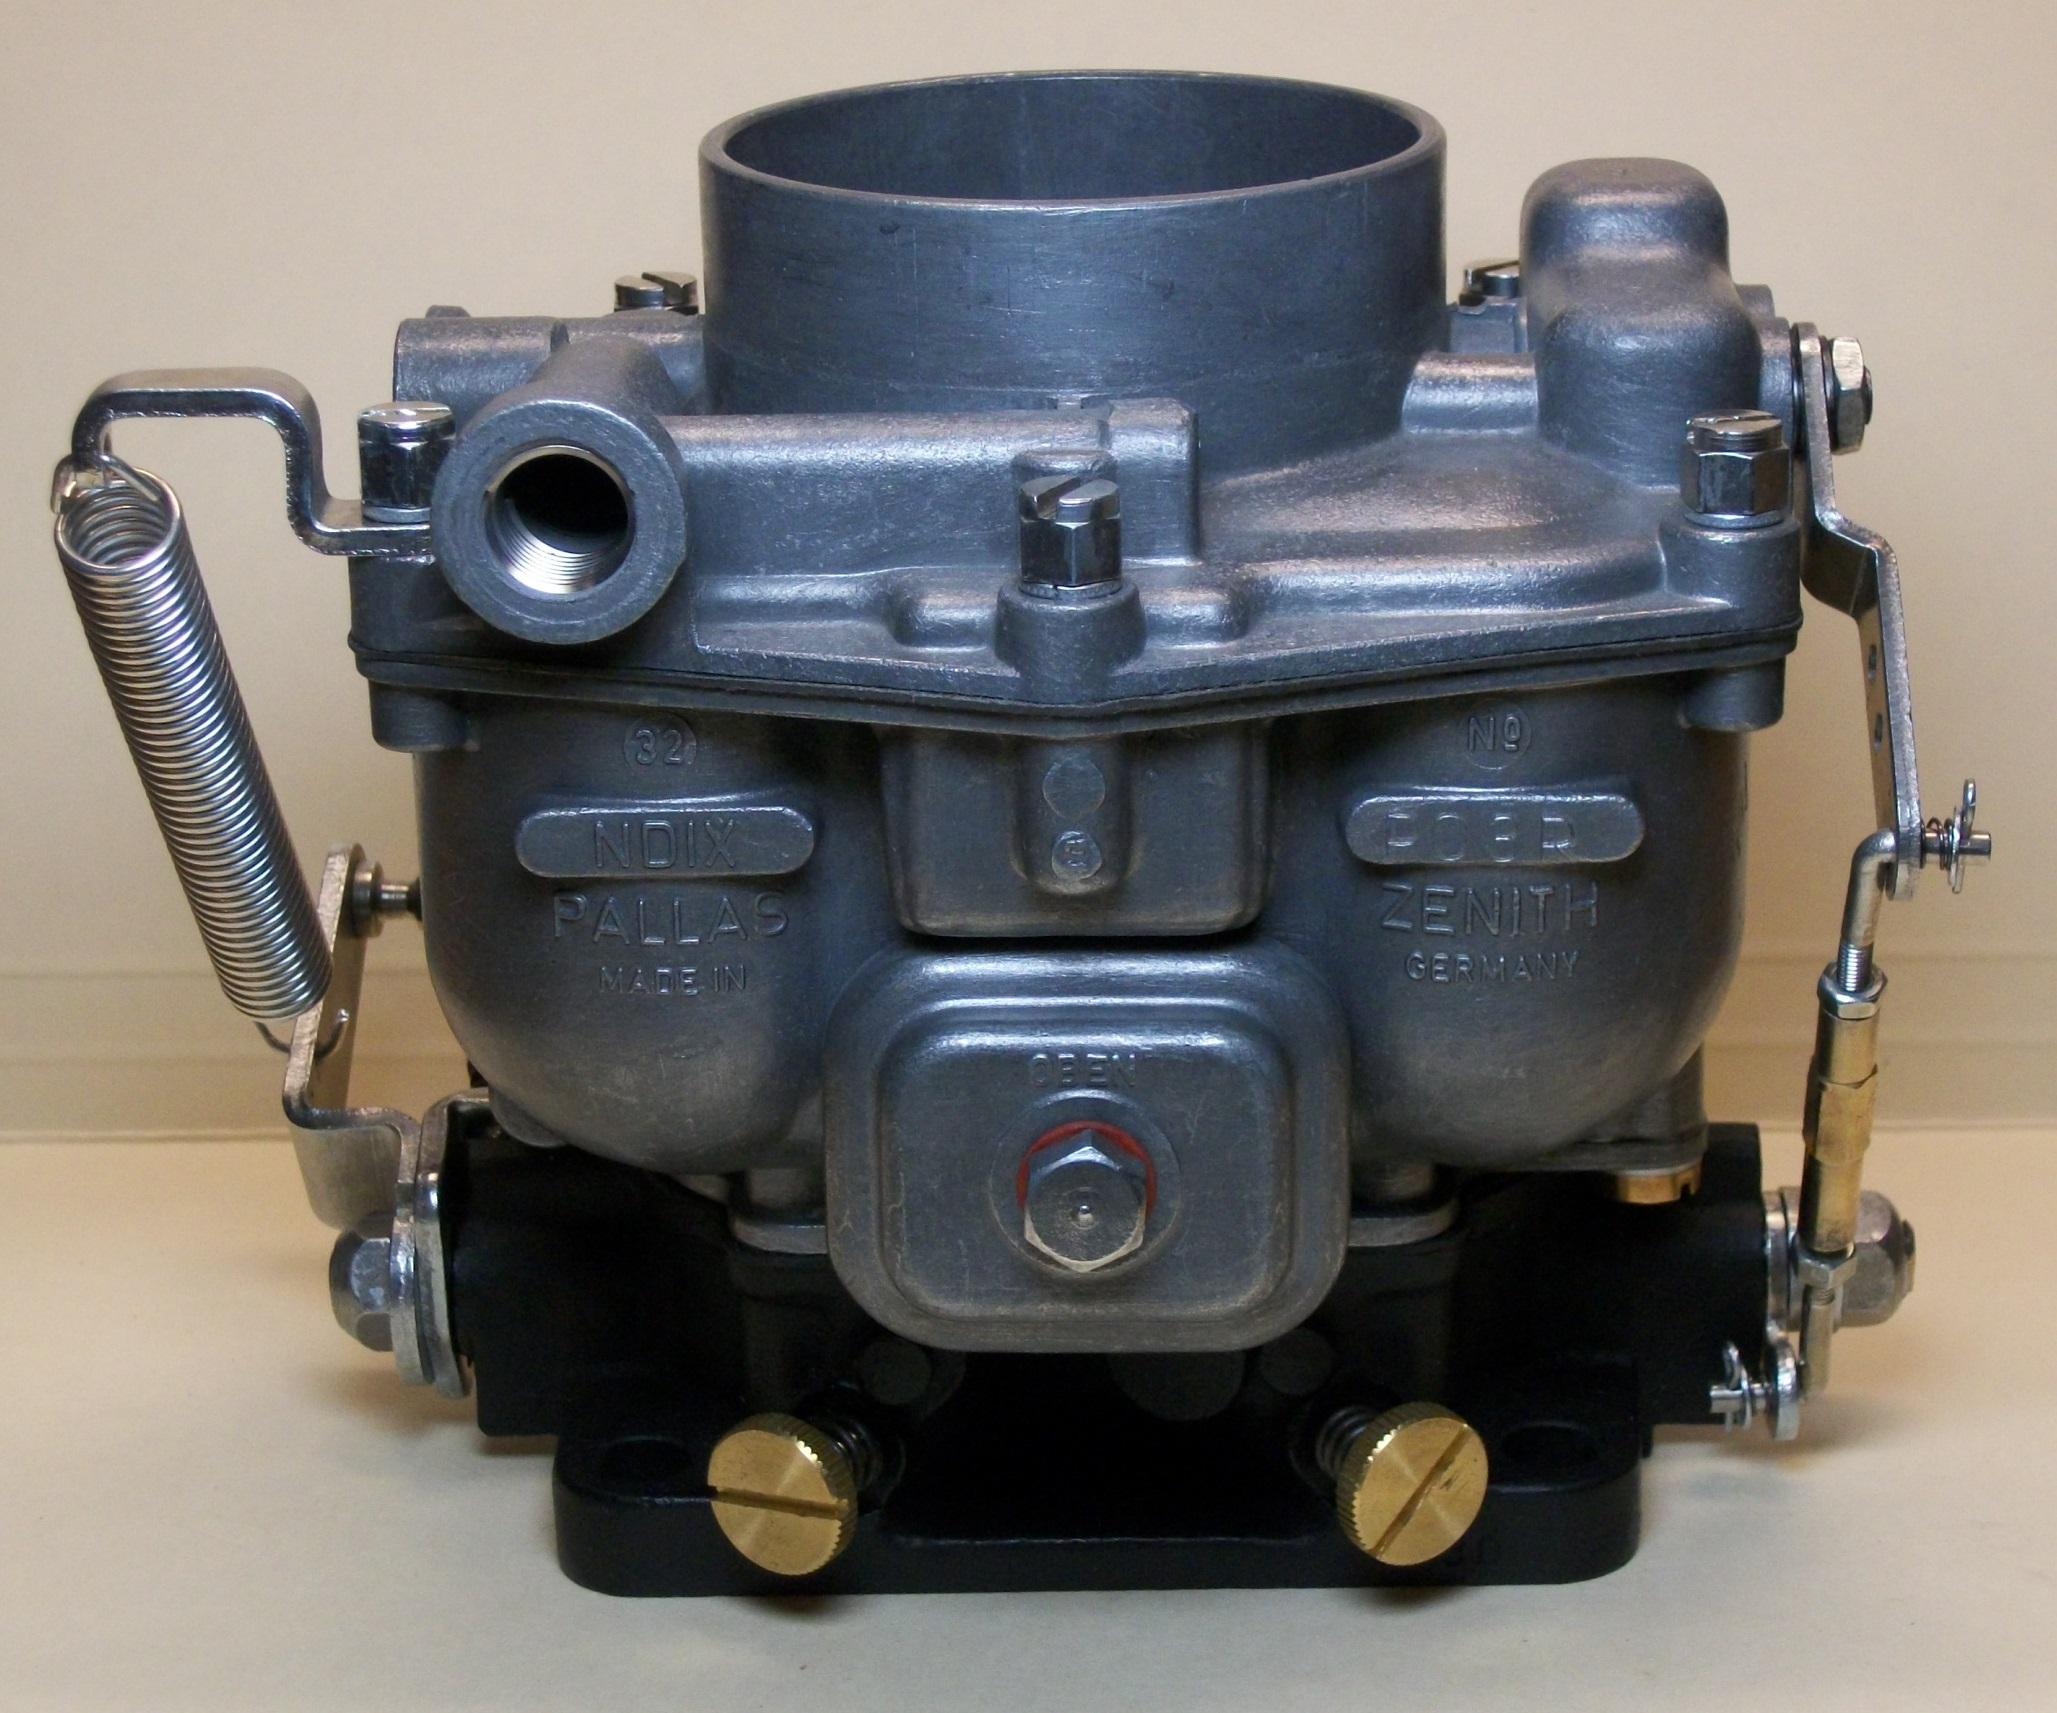 3 4 Plugs >> Carburetors - Carbs-Fuel-Ignition (CFI) - Repair & Sales